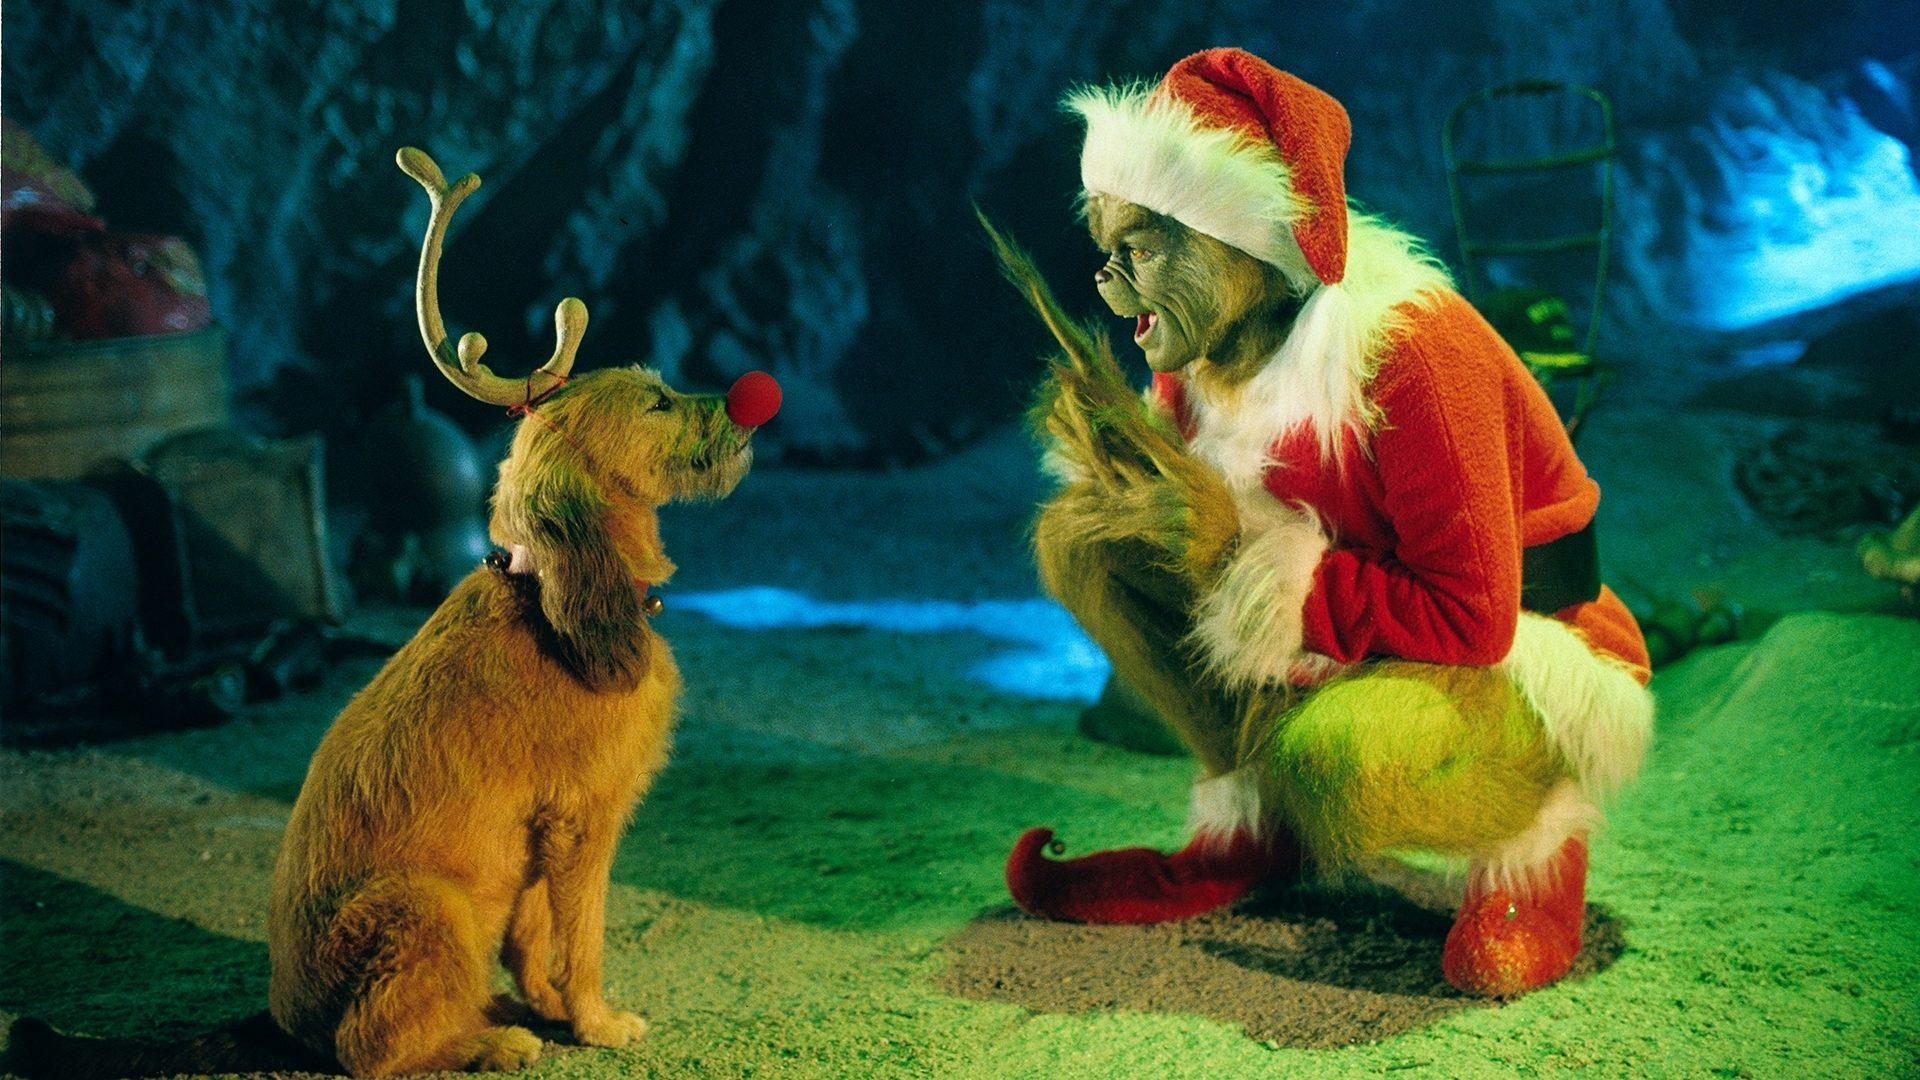 How The Grinch Stole Christmas Nl